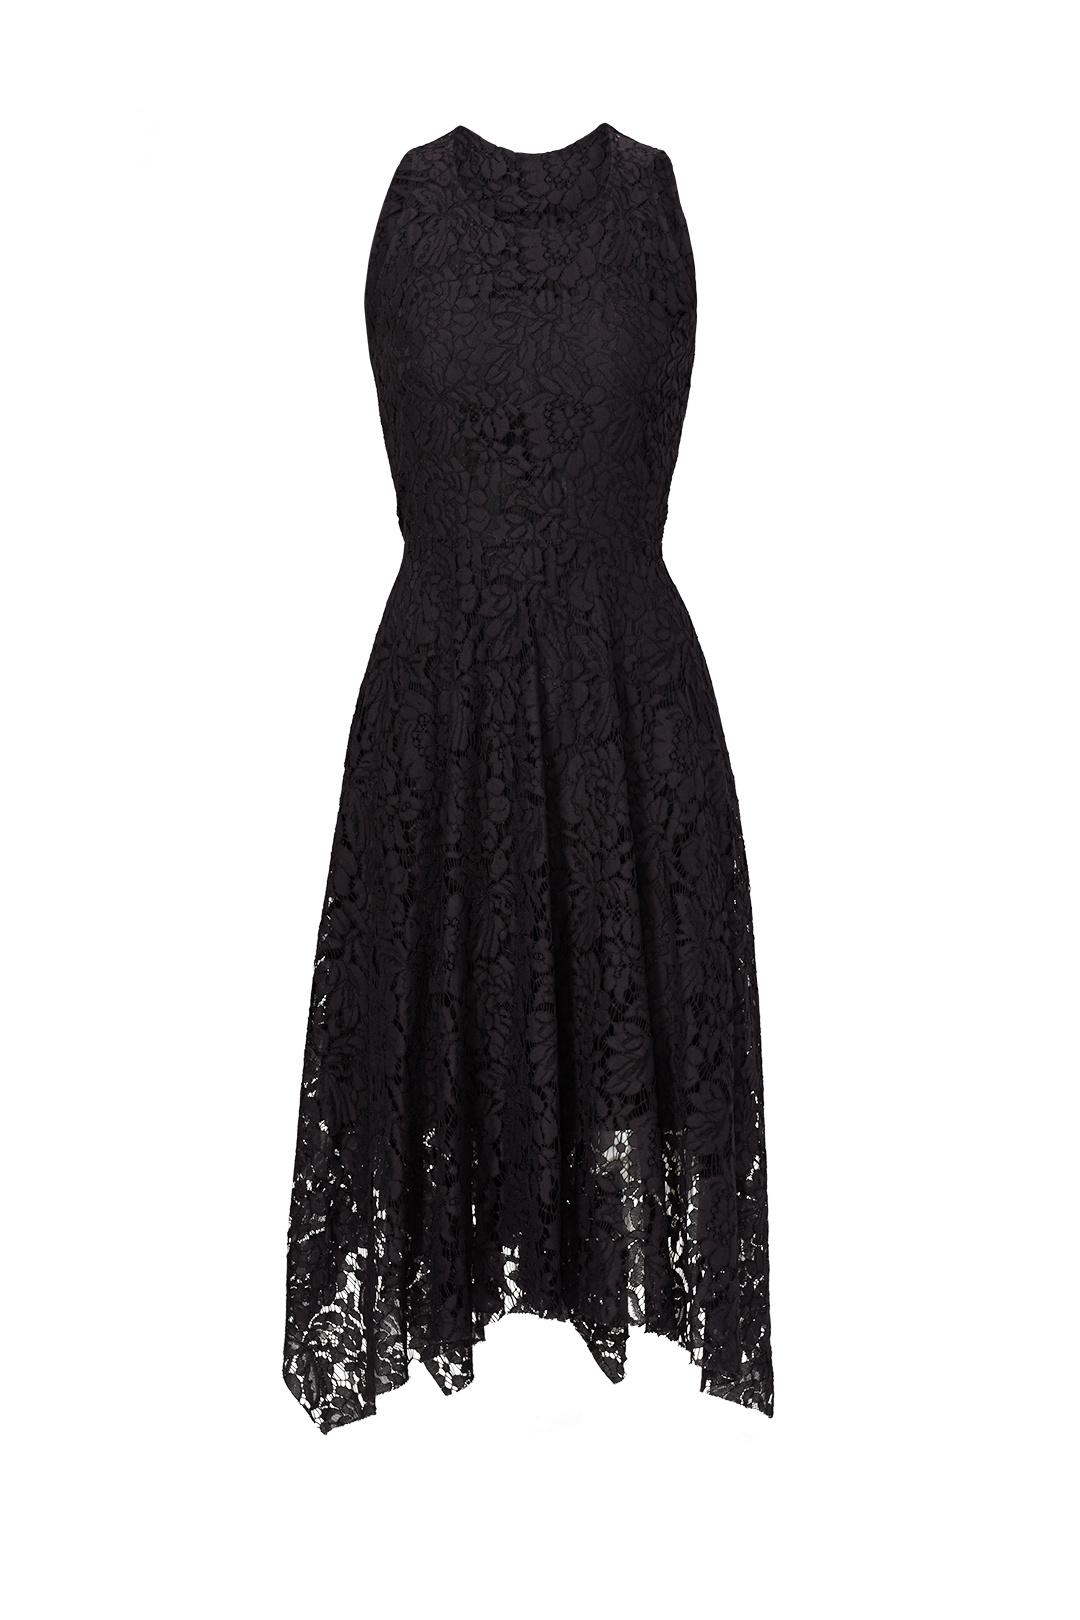 Black lace Handkerchief Hem Dress.jpg